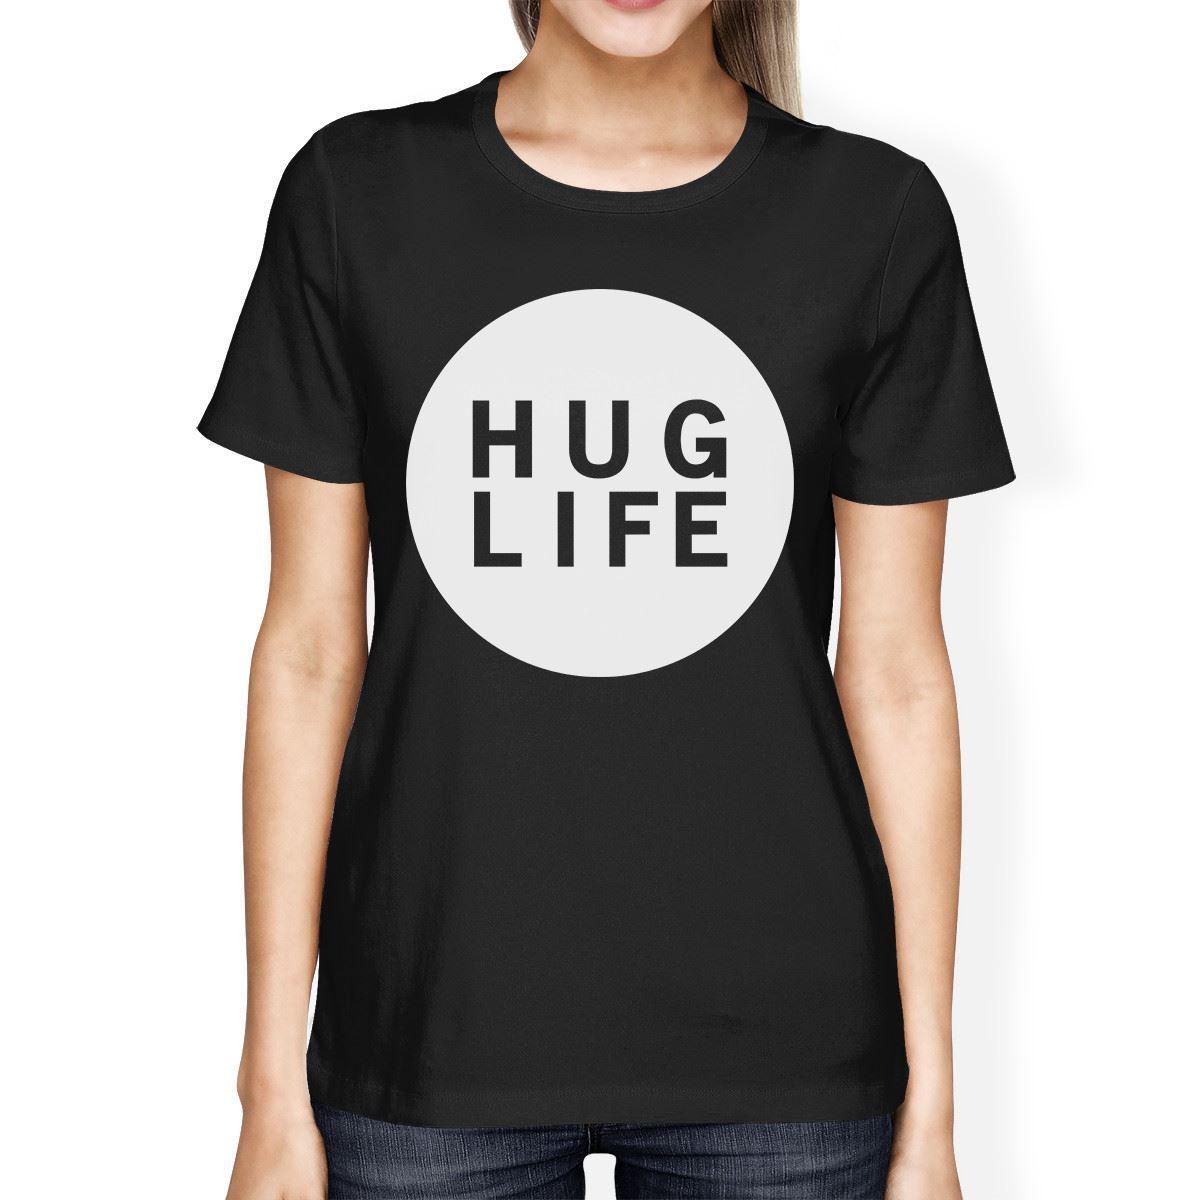 Jay z black t shirt white cross - Hug Life Women S Black T Shirt Short Sleeve Simple Graphic Shirt Female Fashion Cotton Hip